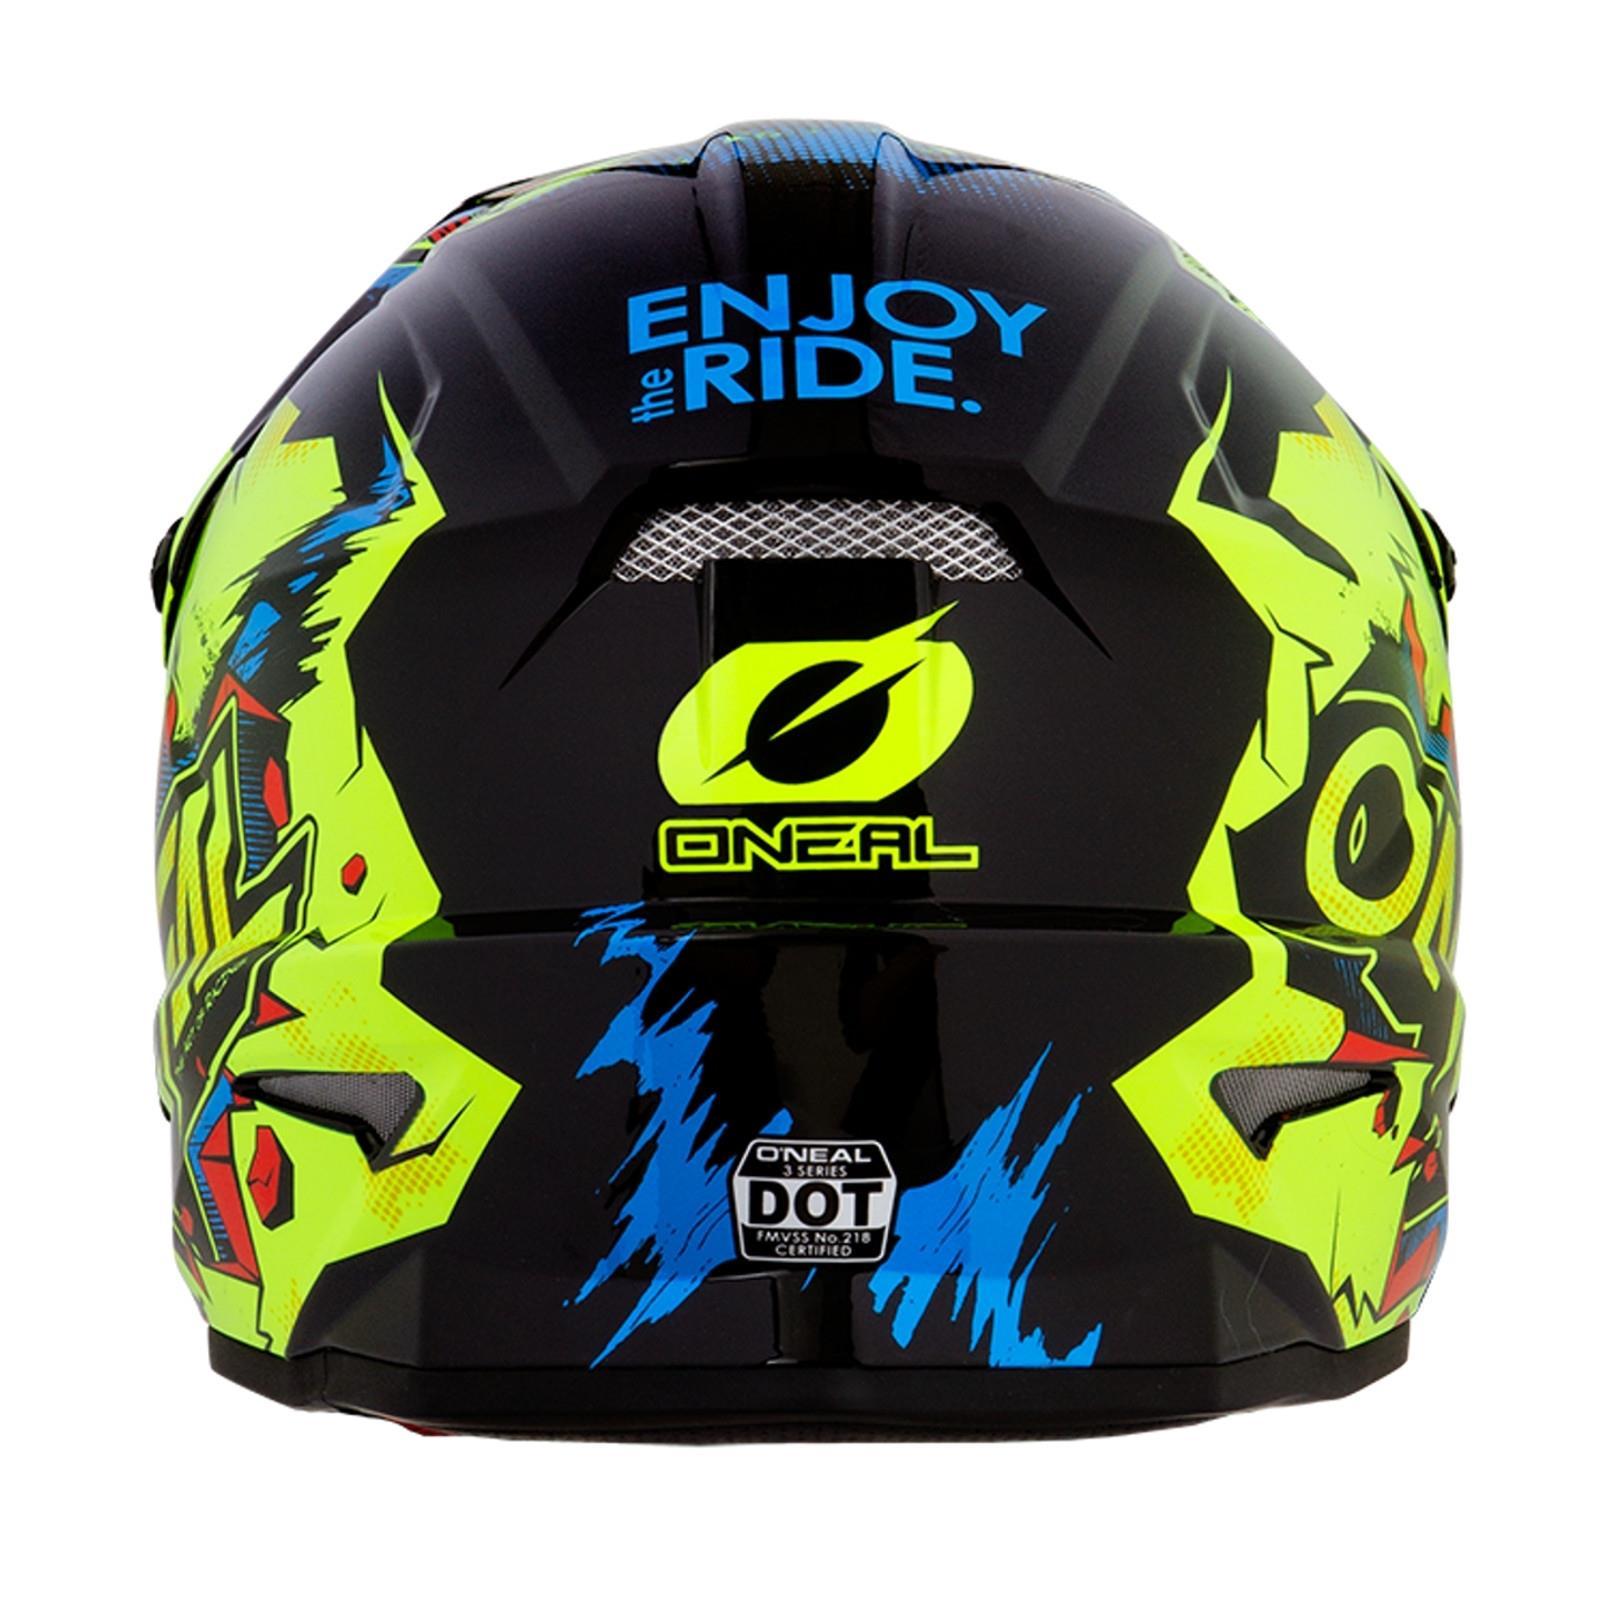 ONeal-Motocross-casco-MX-ENDURO-MOTO-BICI-FUORISTRADA-CROSS-Series-Adventure miniatura 50